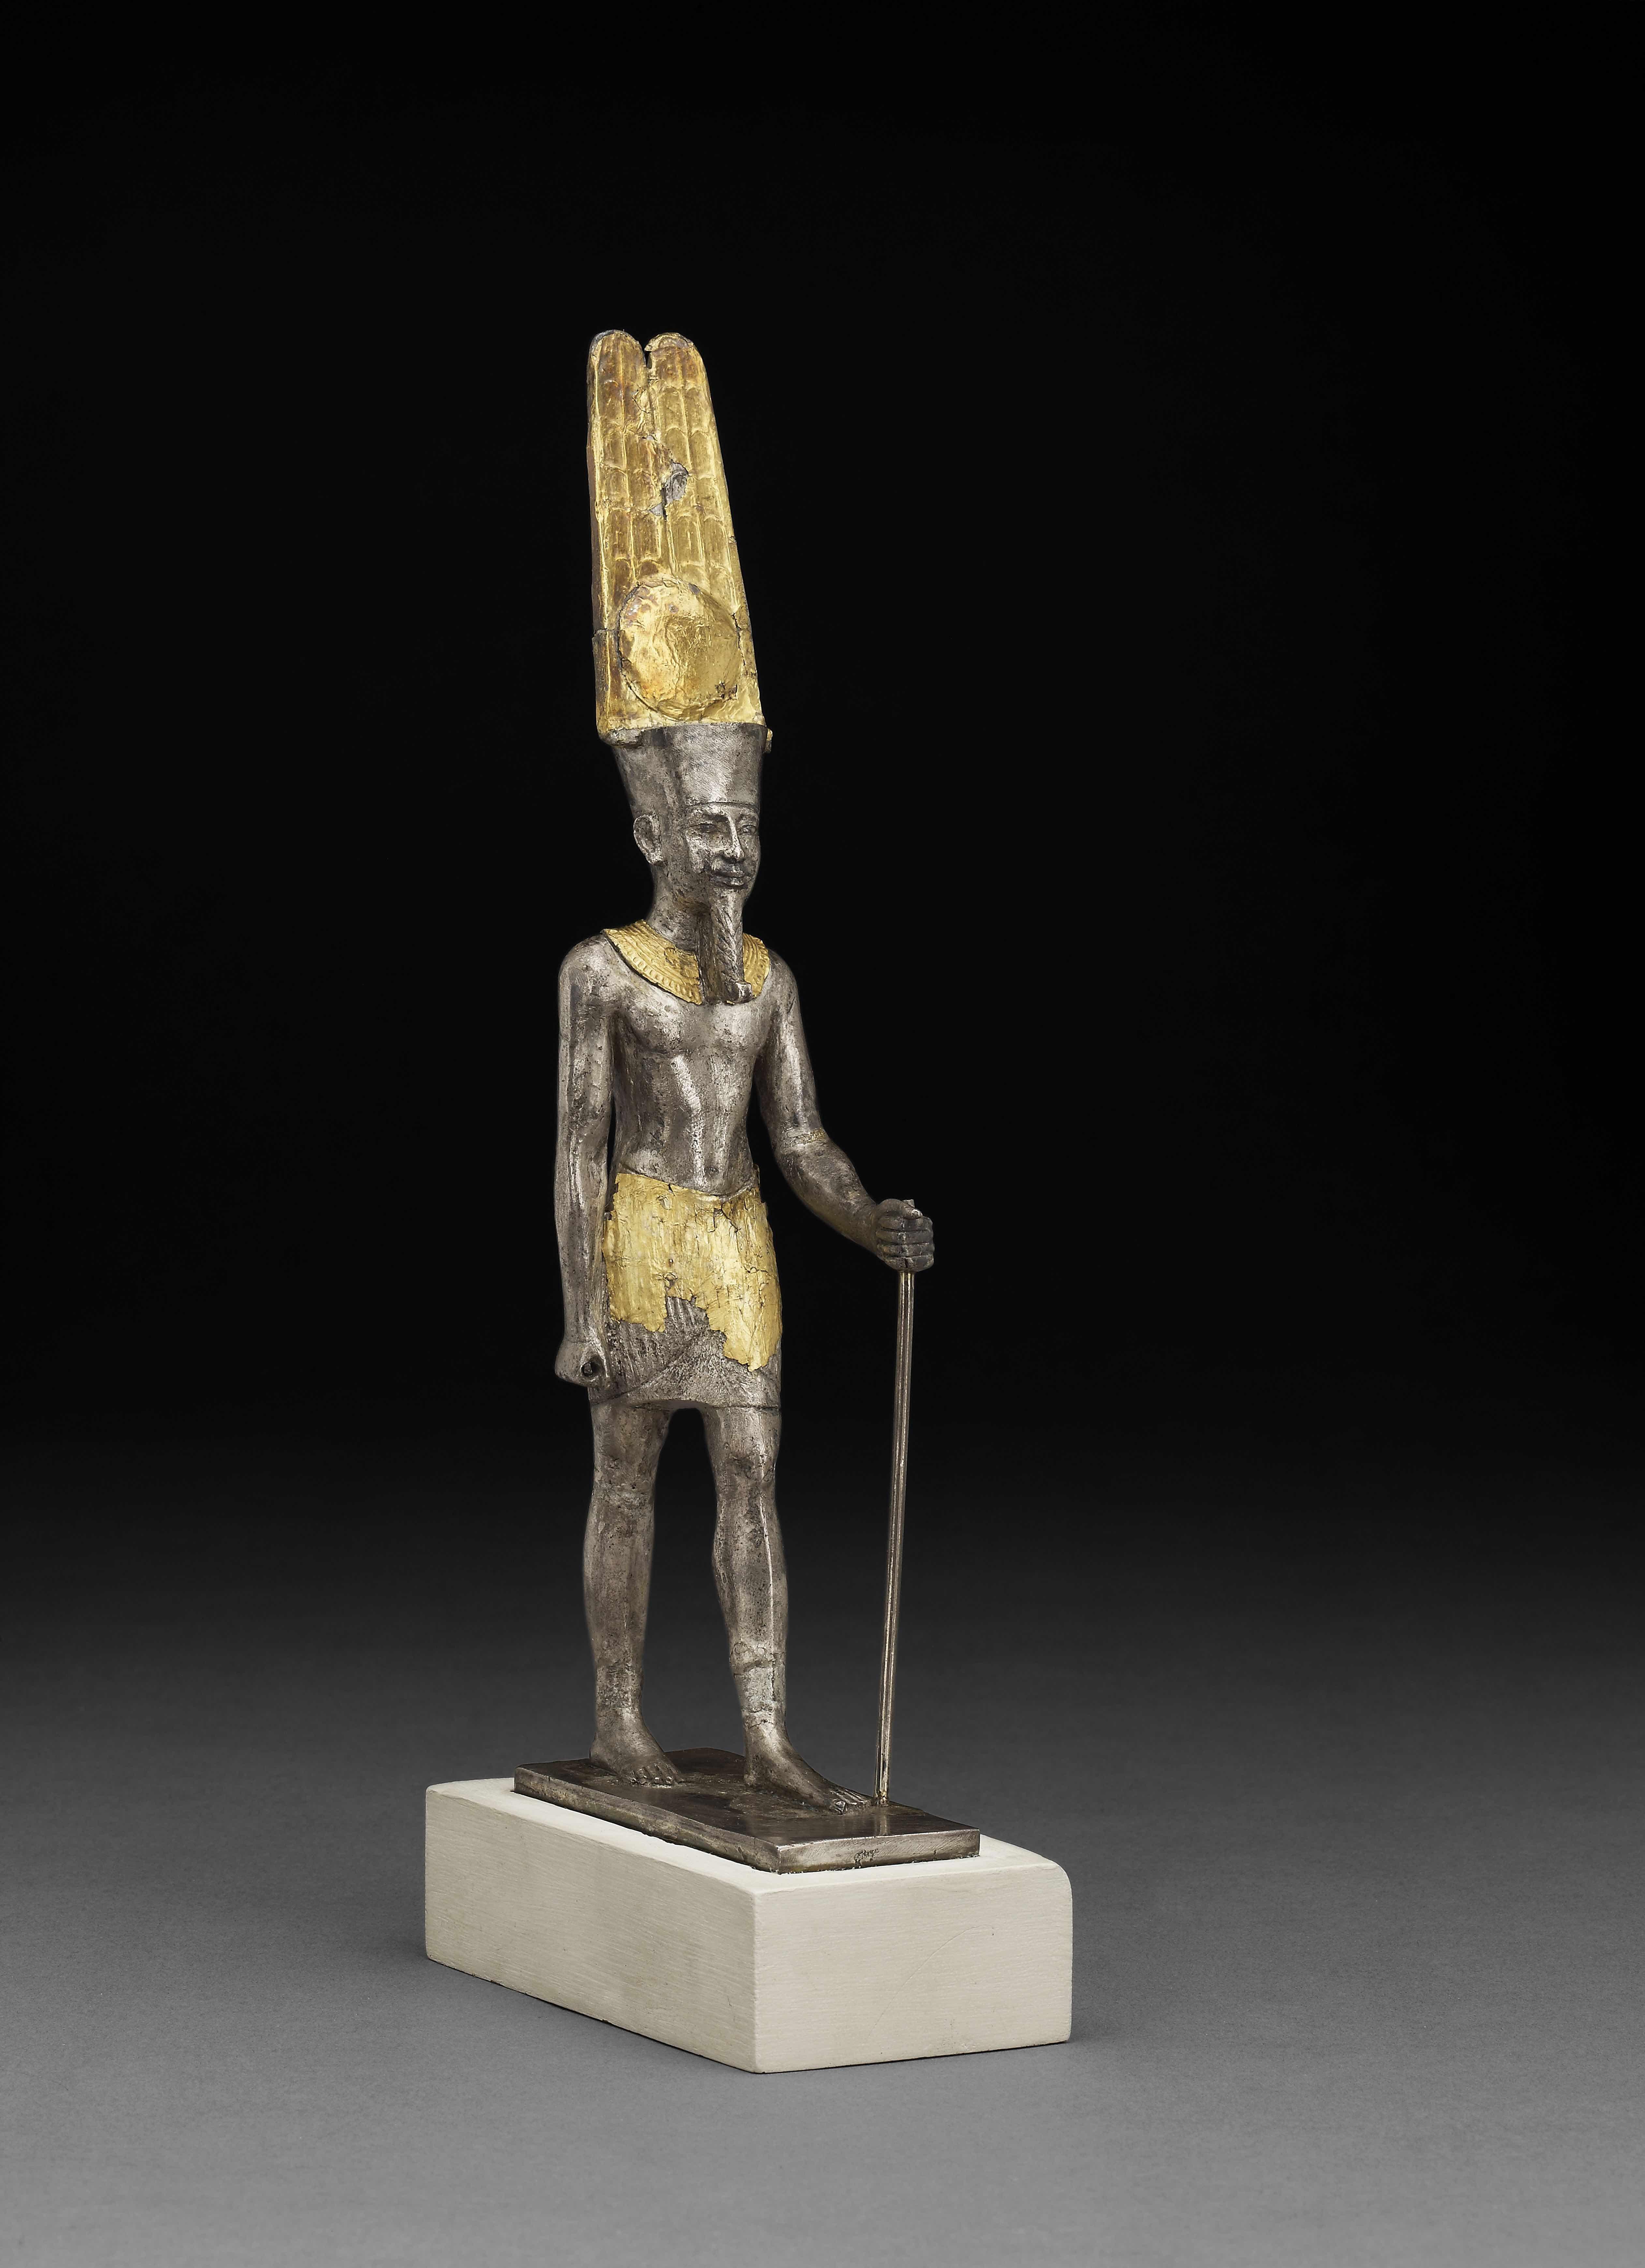 estatuilla-del-dios-amon-re-plata-sobredorada-c-1069-664-a-c-karnak-tebas-egipto-c-trustees-of-the-british-museum